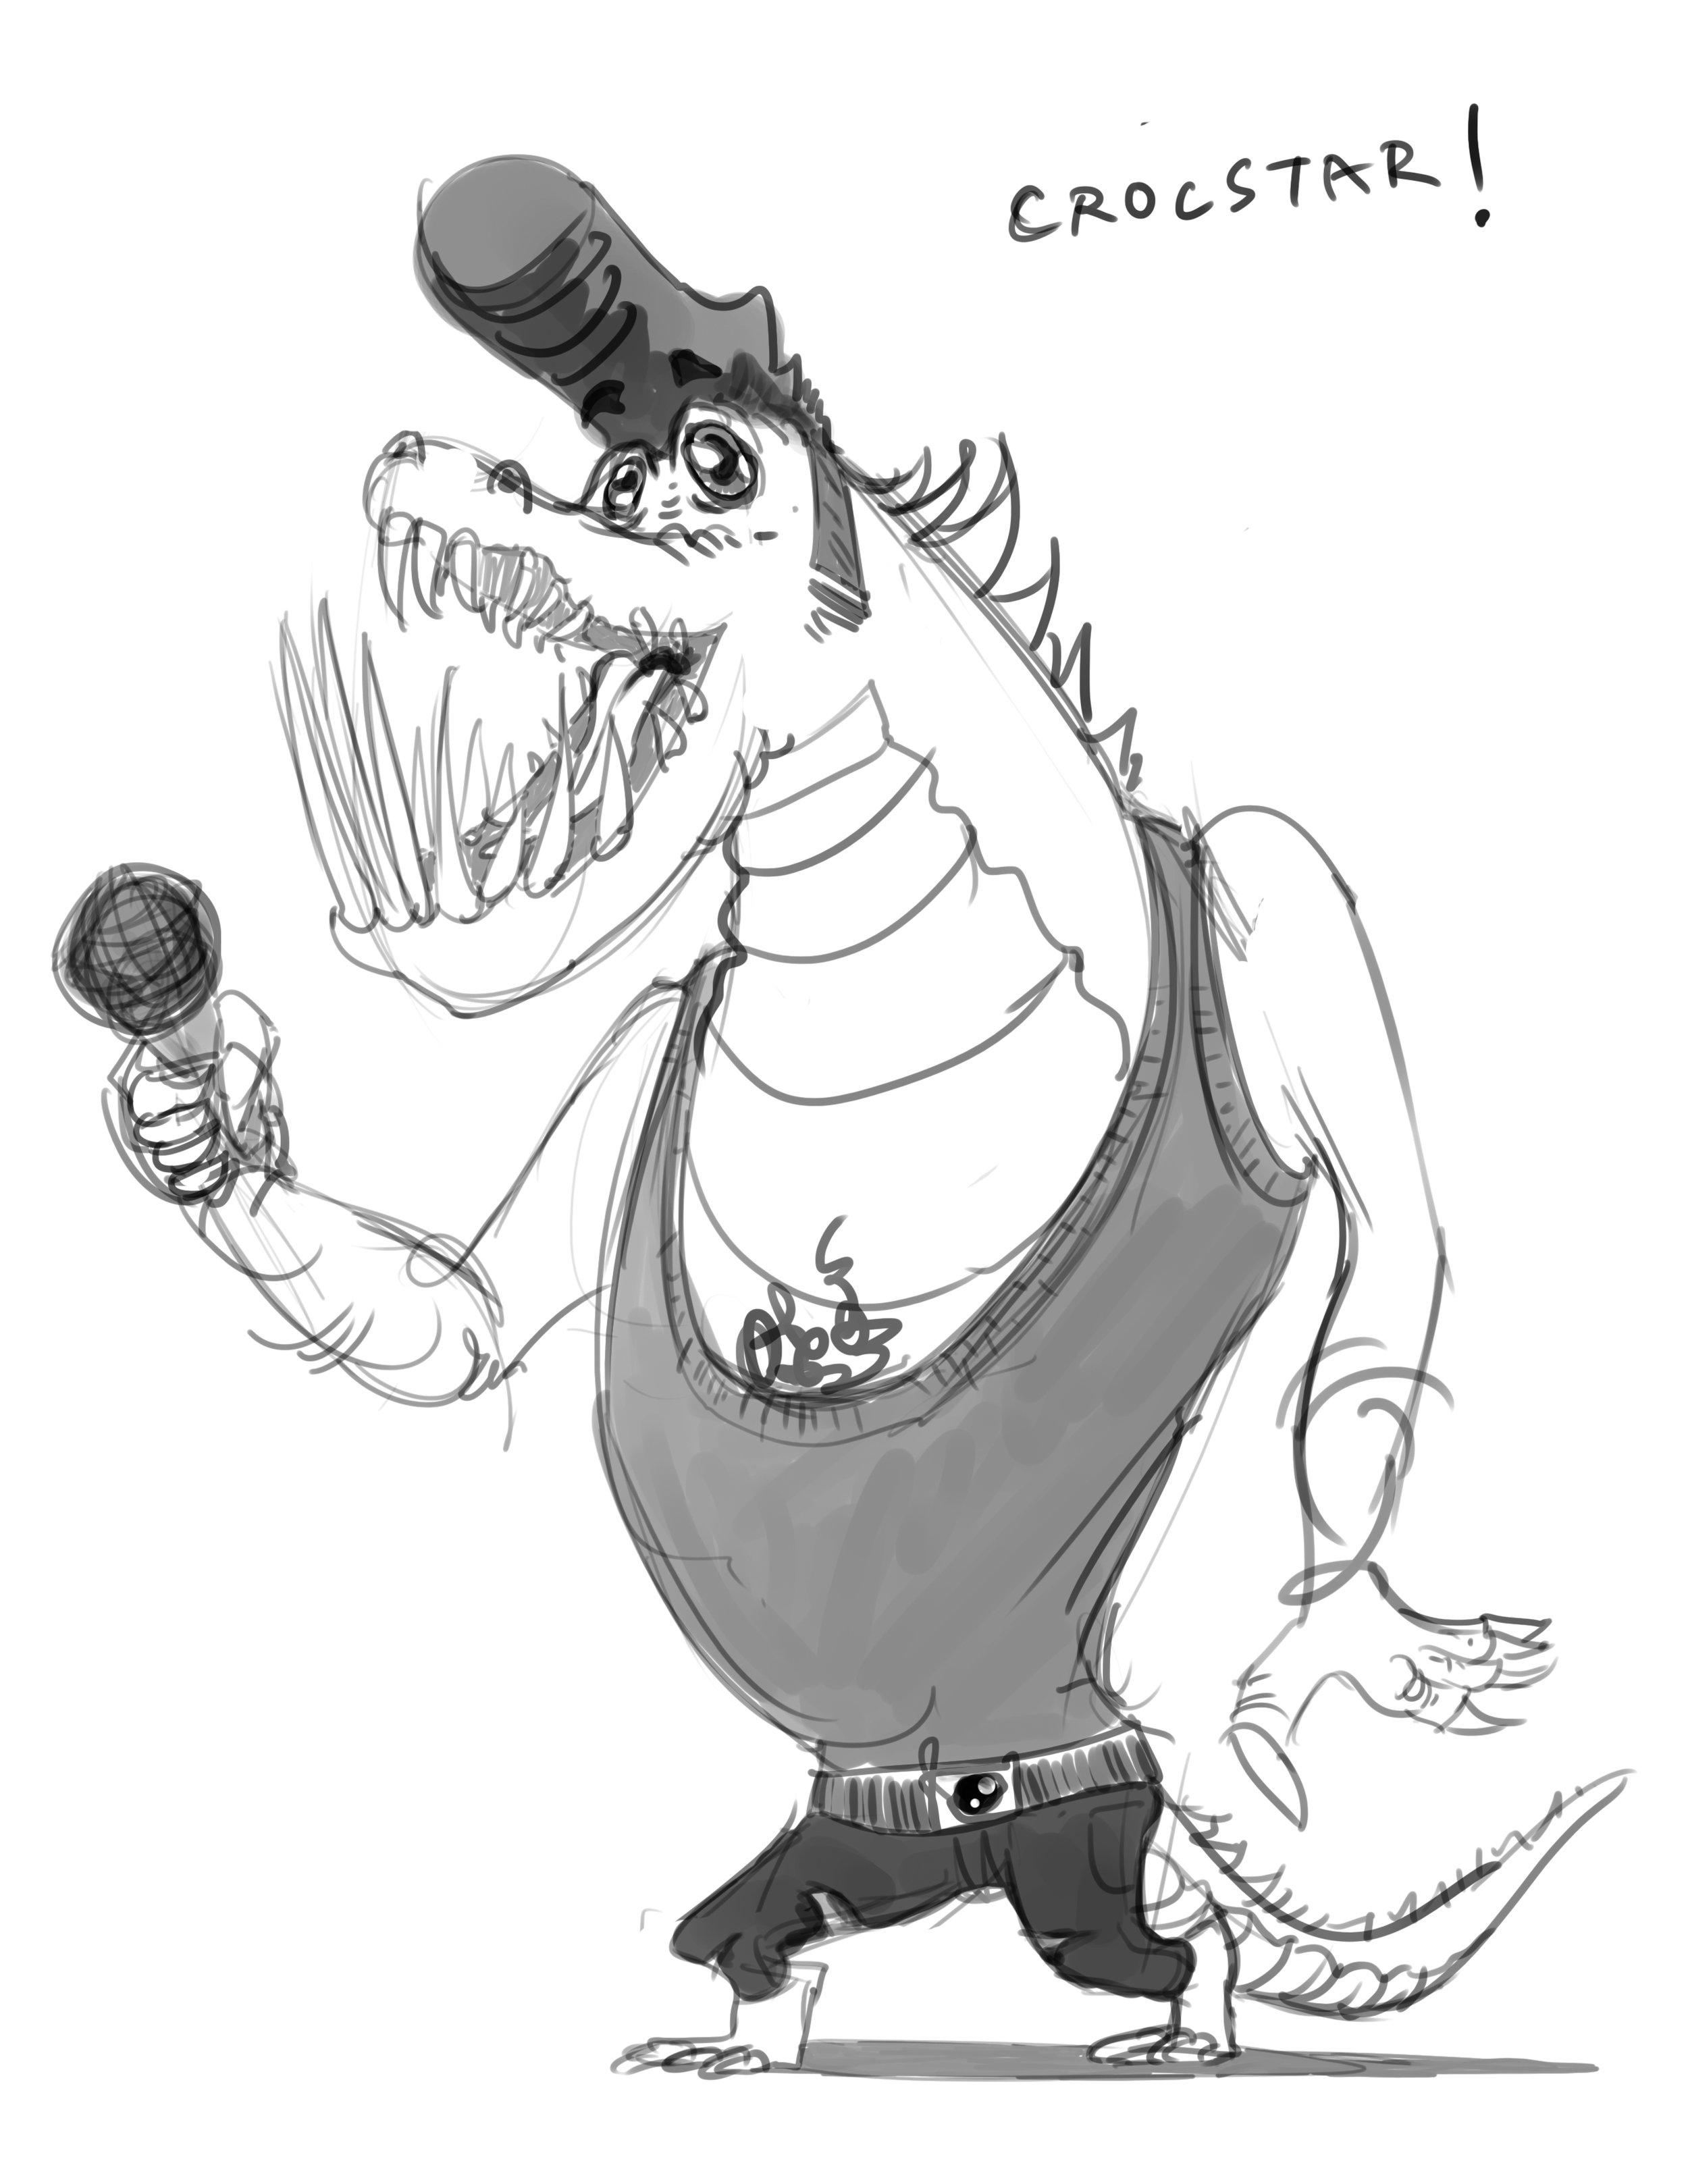 Character design - crocstar.jpg